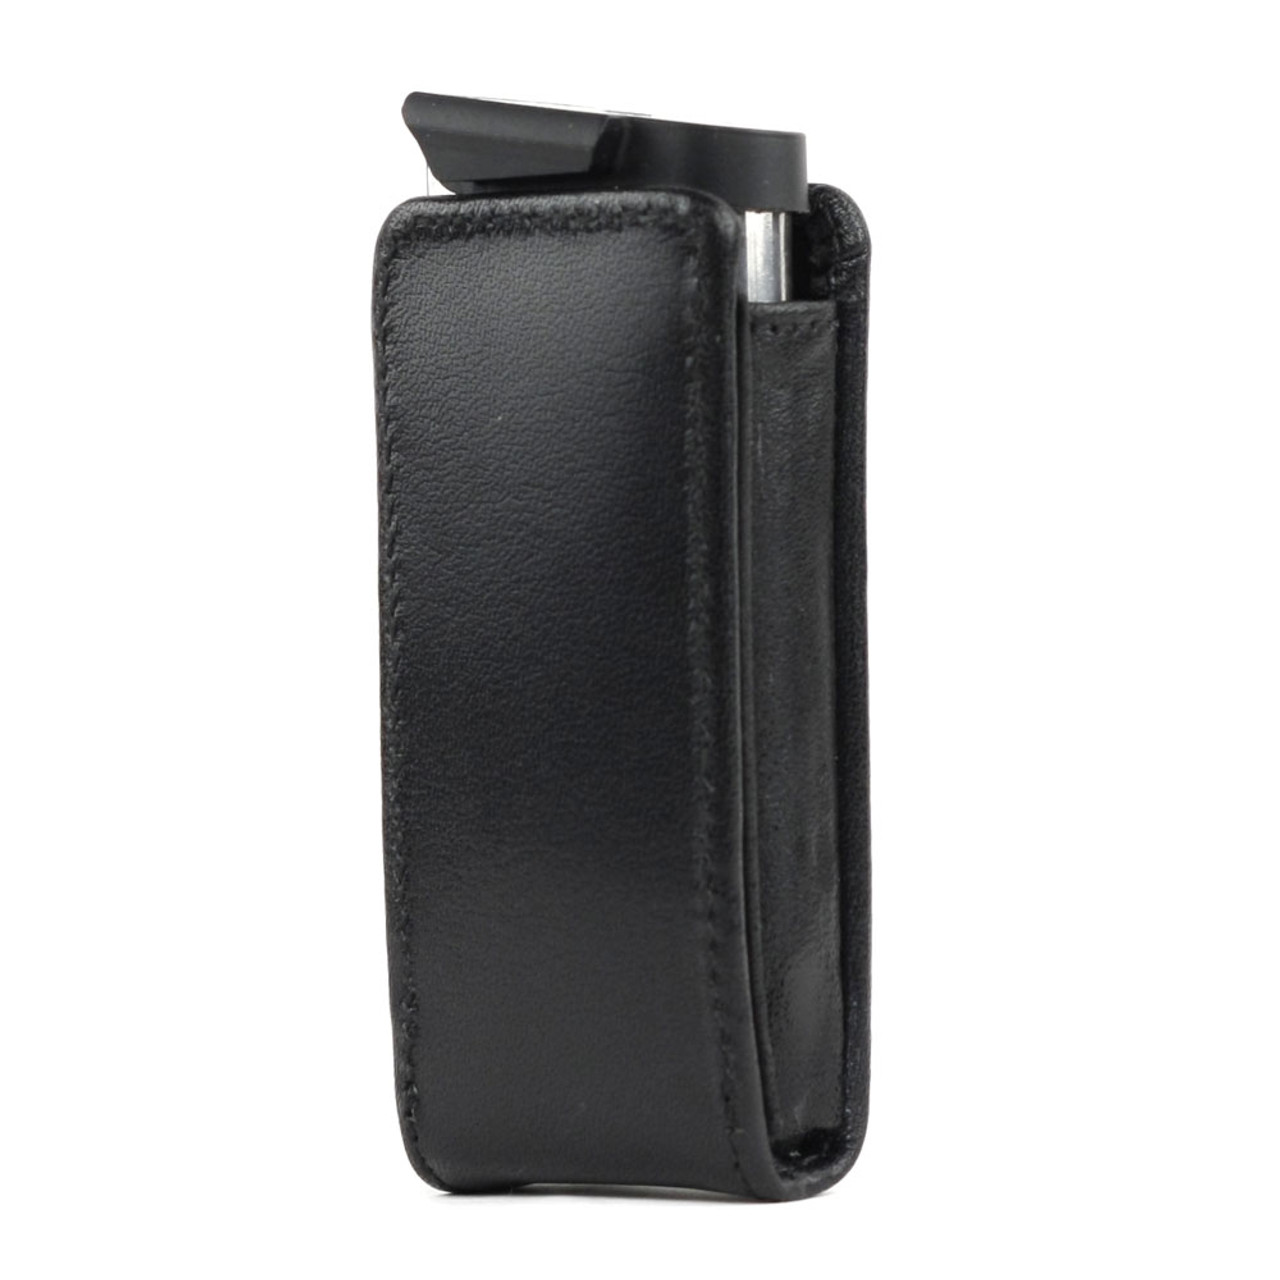 M&P Shield 9mm Magazine Pocket Protector